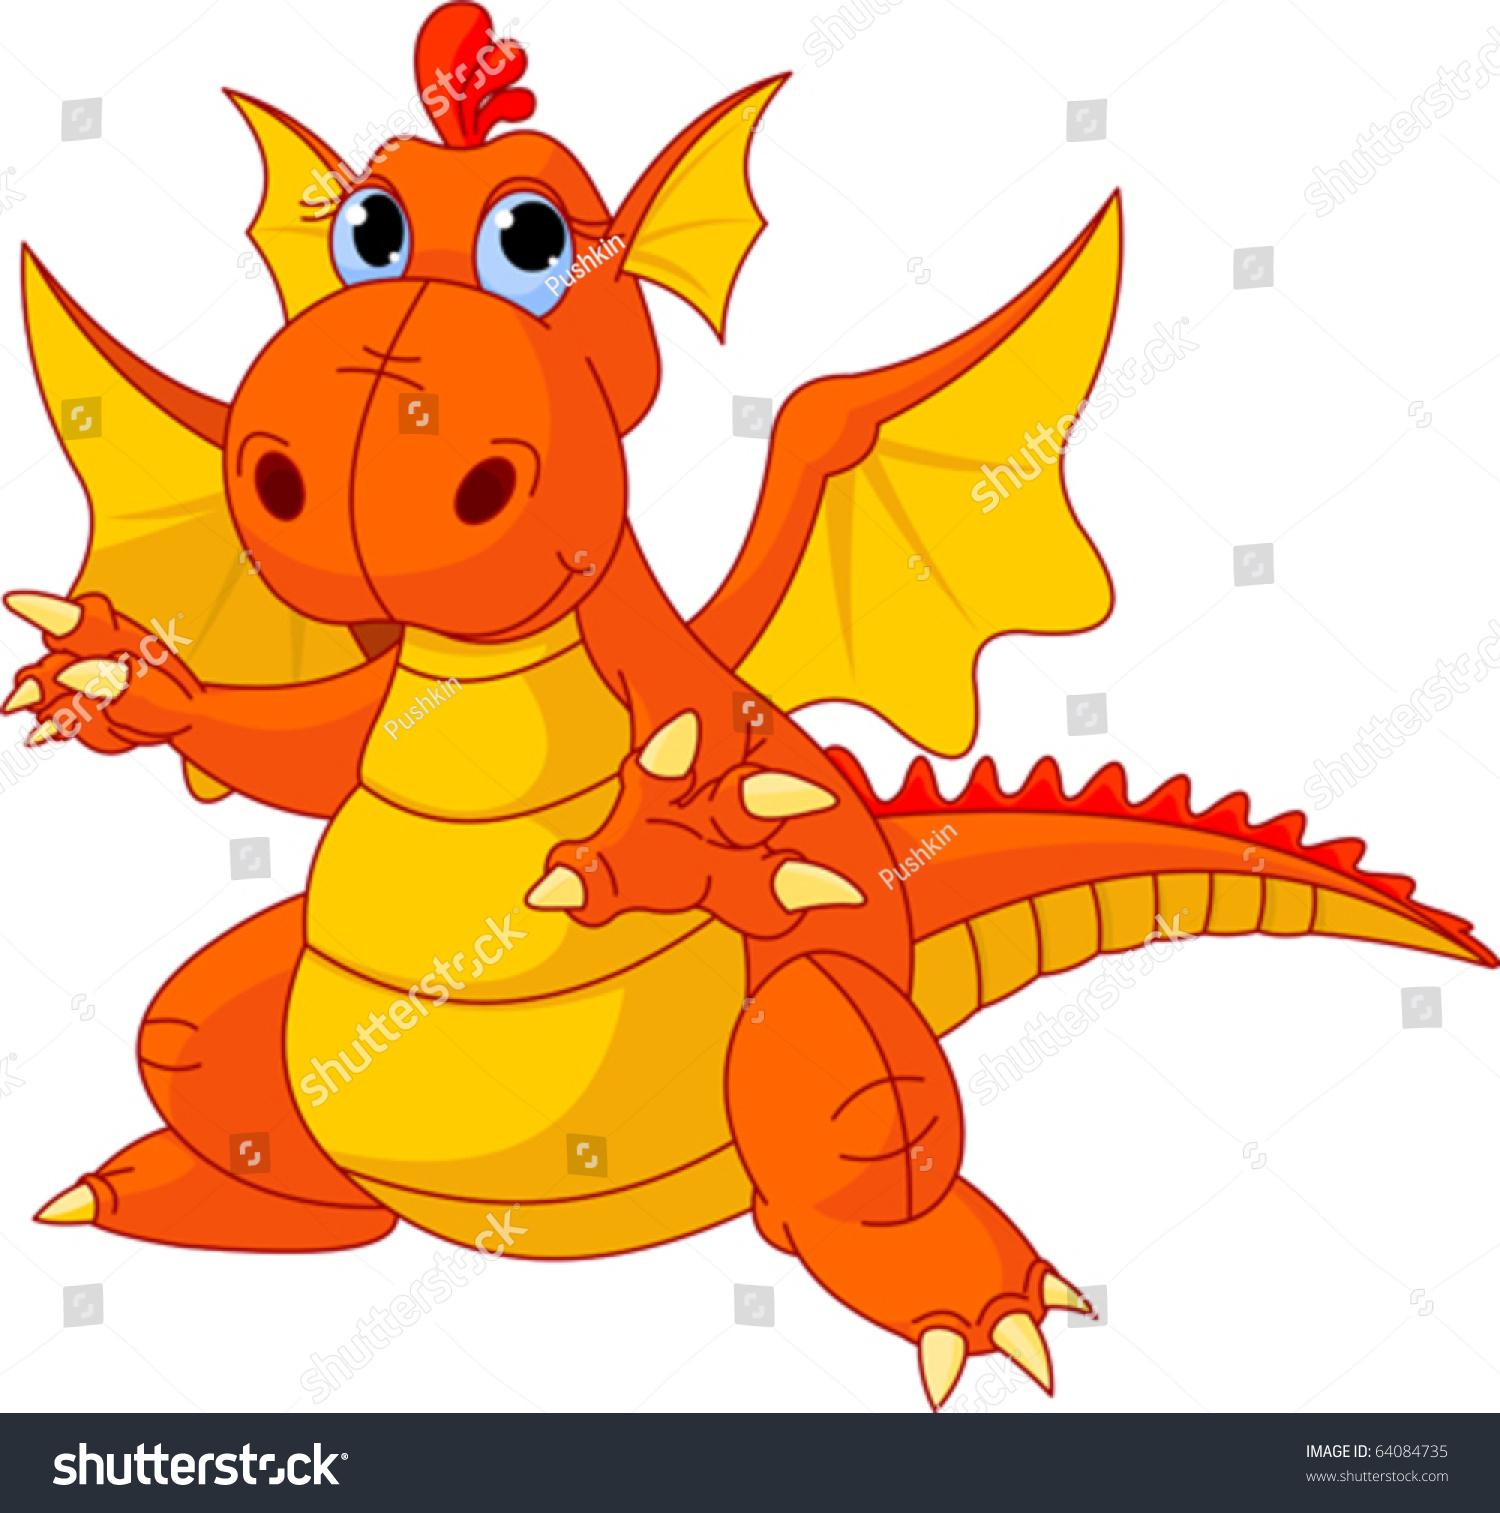 Illustration Cute Cartoon Baby Dragon Pointing Stock